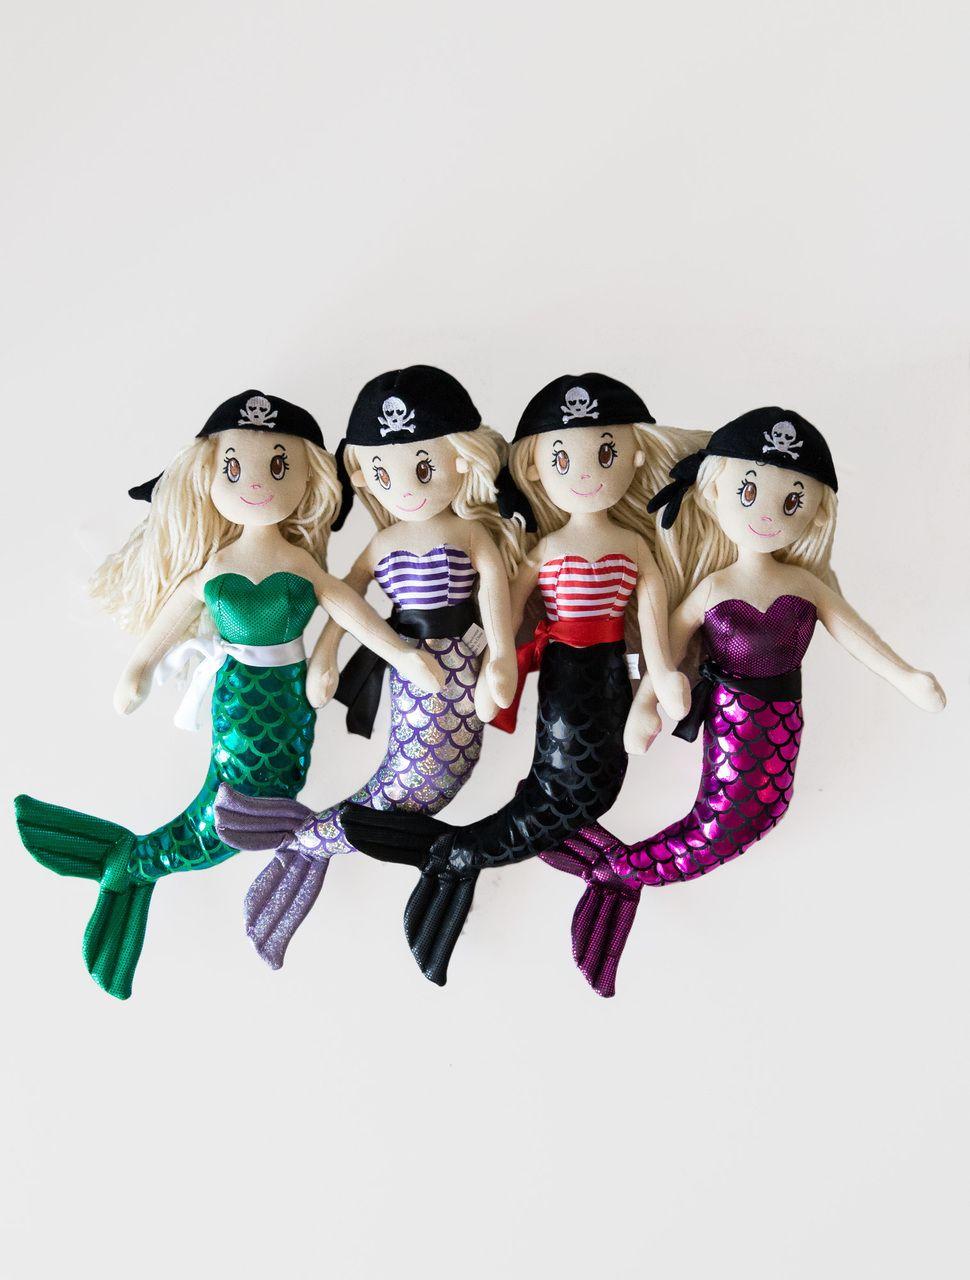 Eagles Beachwear - Pirate Mermaid Plush, $5.99 (http://eaglesbeachwear.net/pirate-mermaid-plush/)